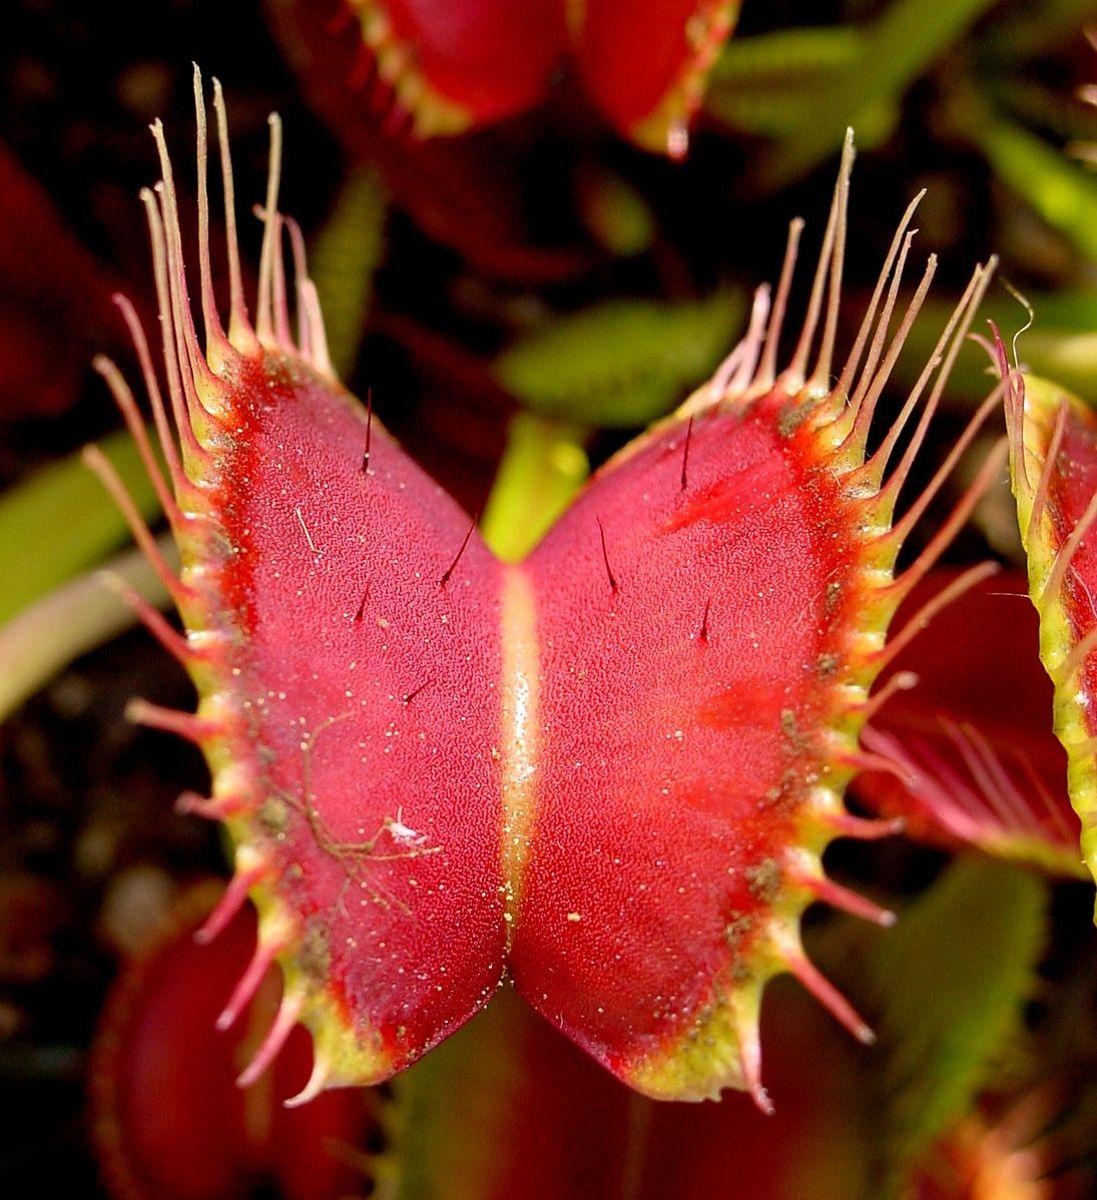 Growing Carnivorous Plants That Eat Bugs